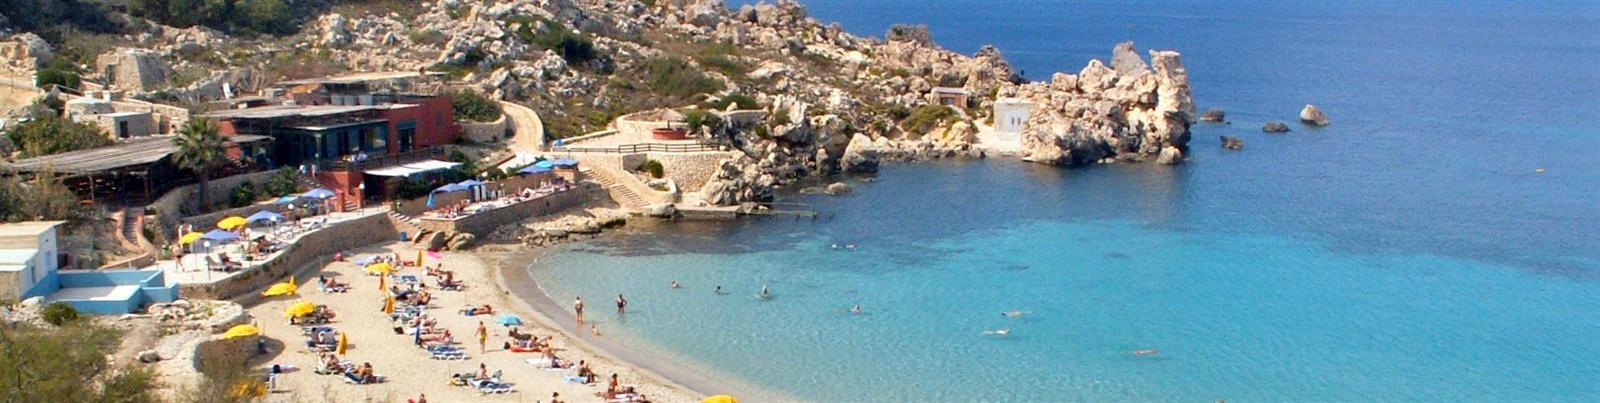 Rocky bays in Malta